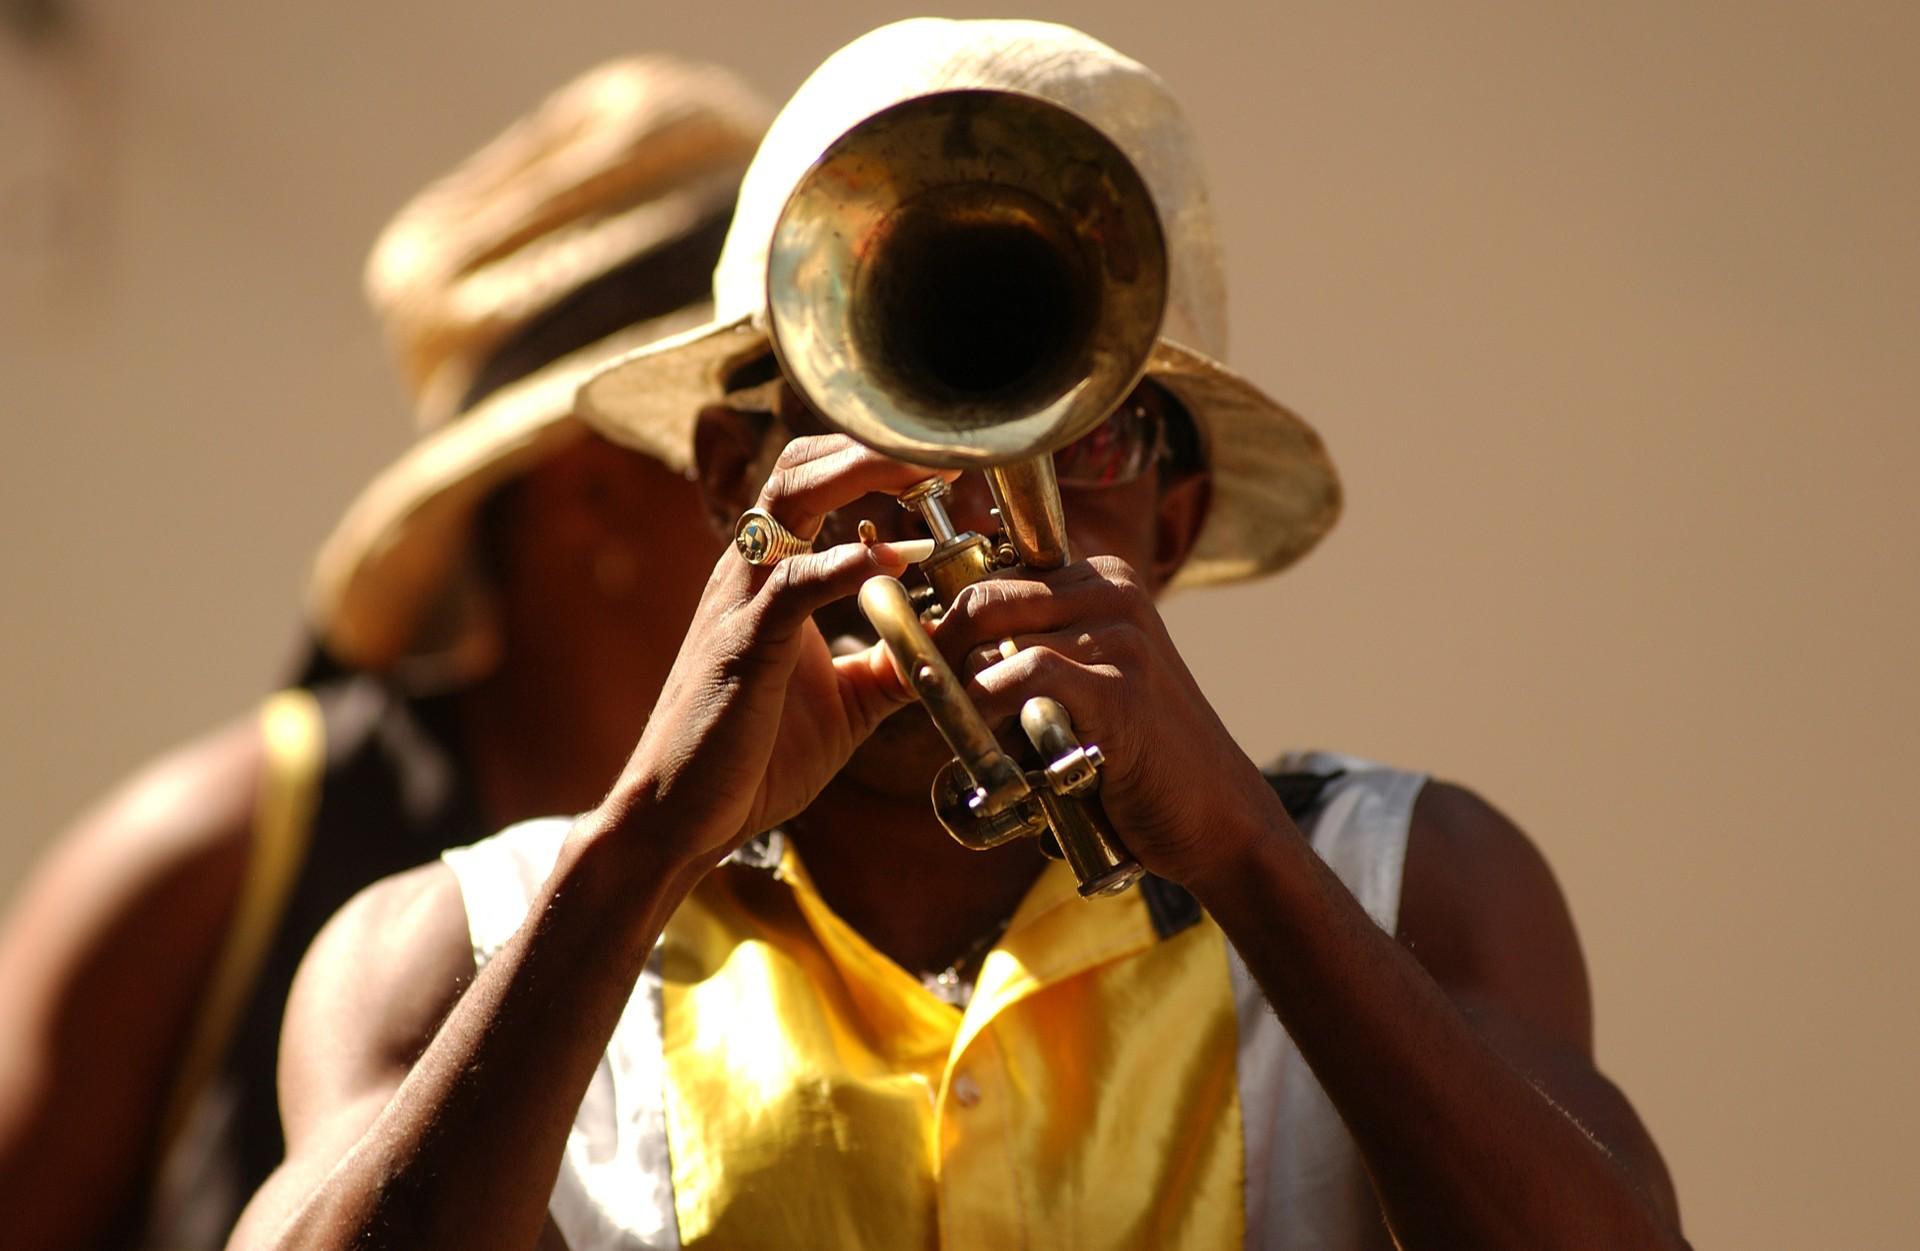 A jazz musician plays the trumpet in Havana, Cuba